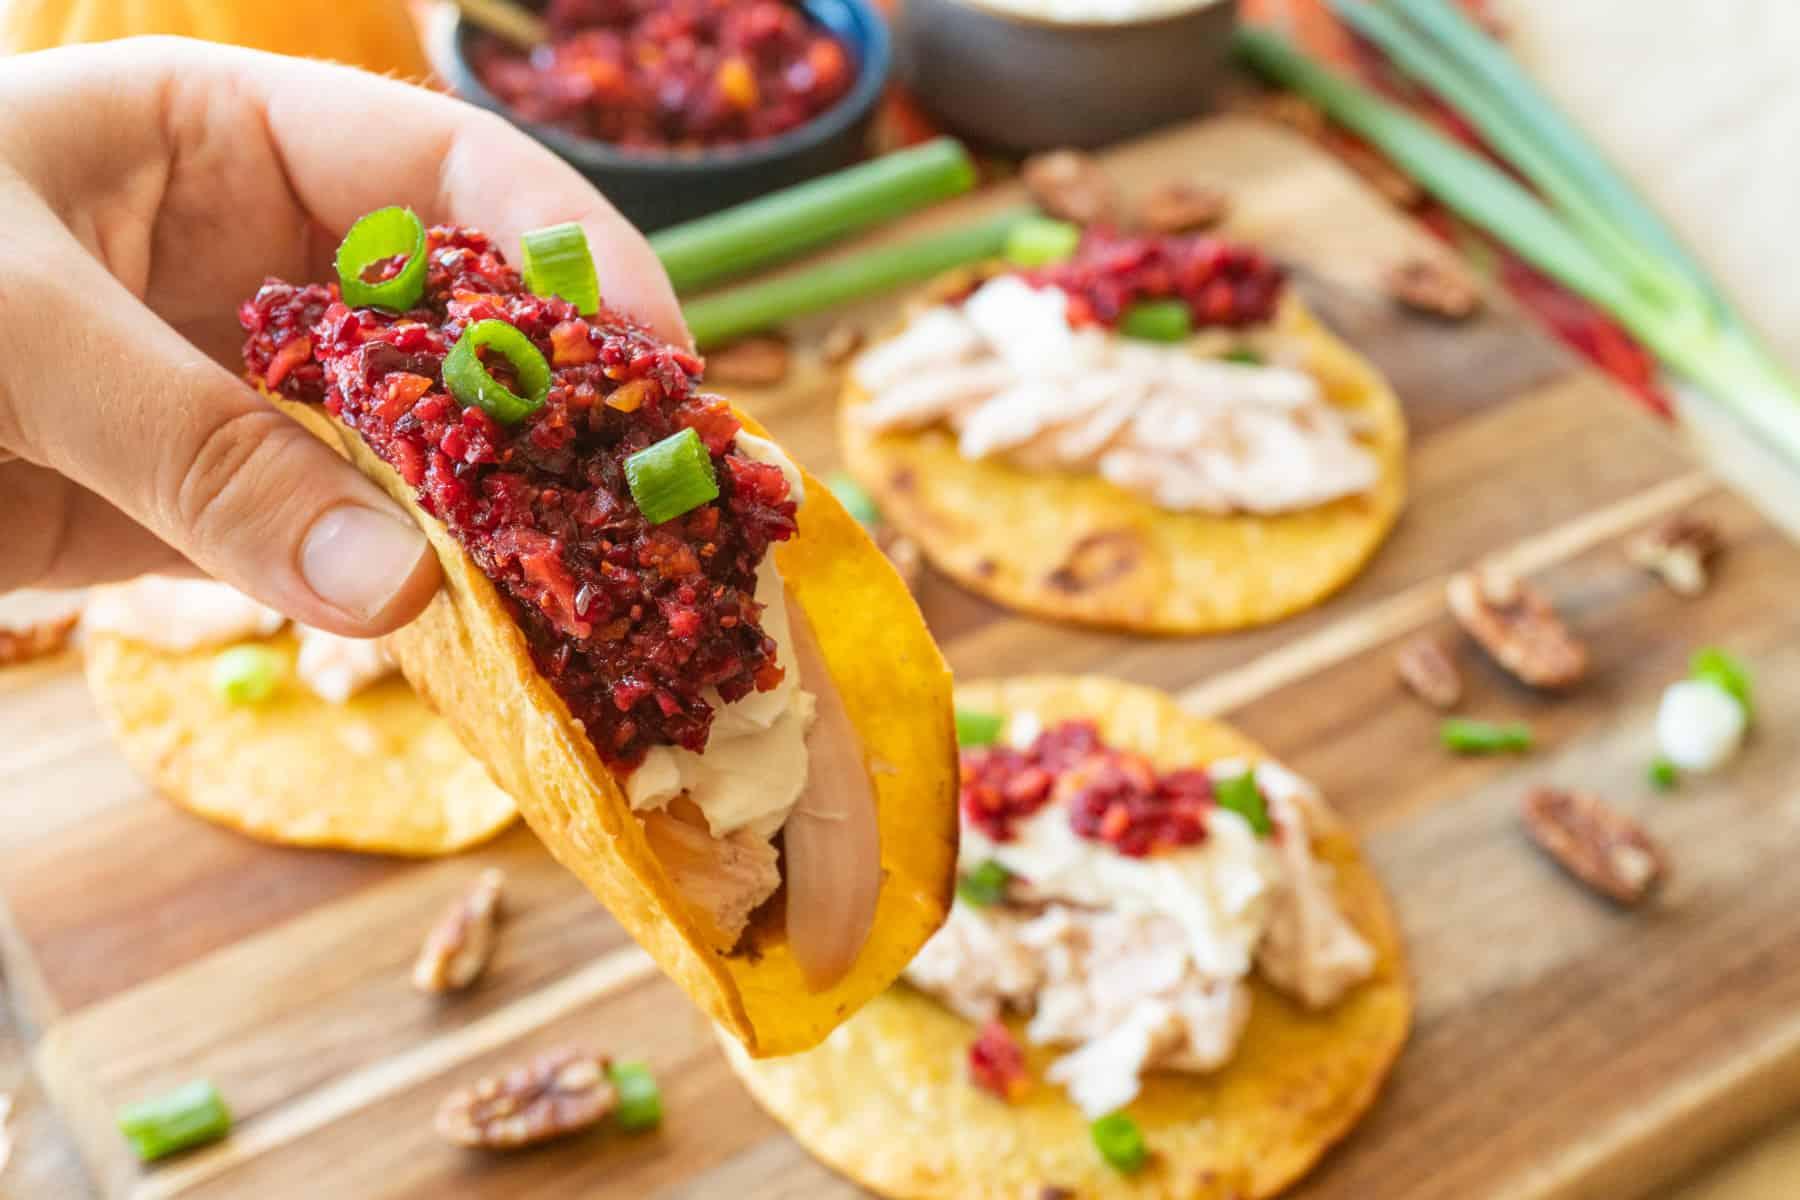 Holding a taco